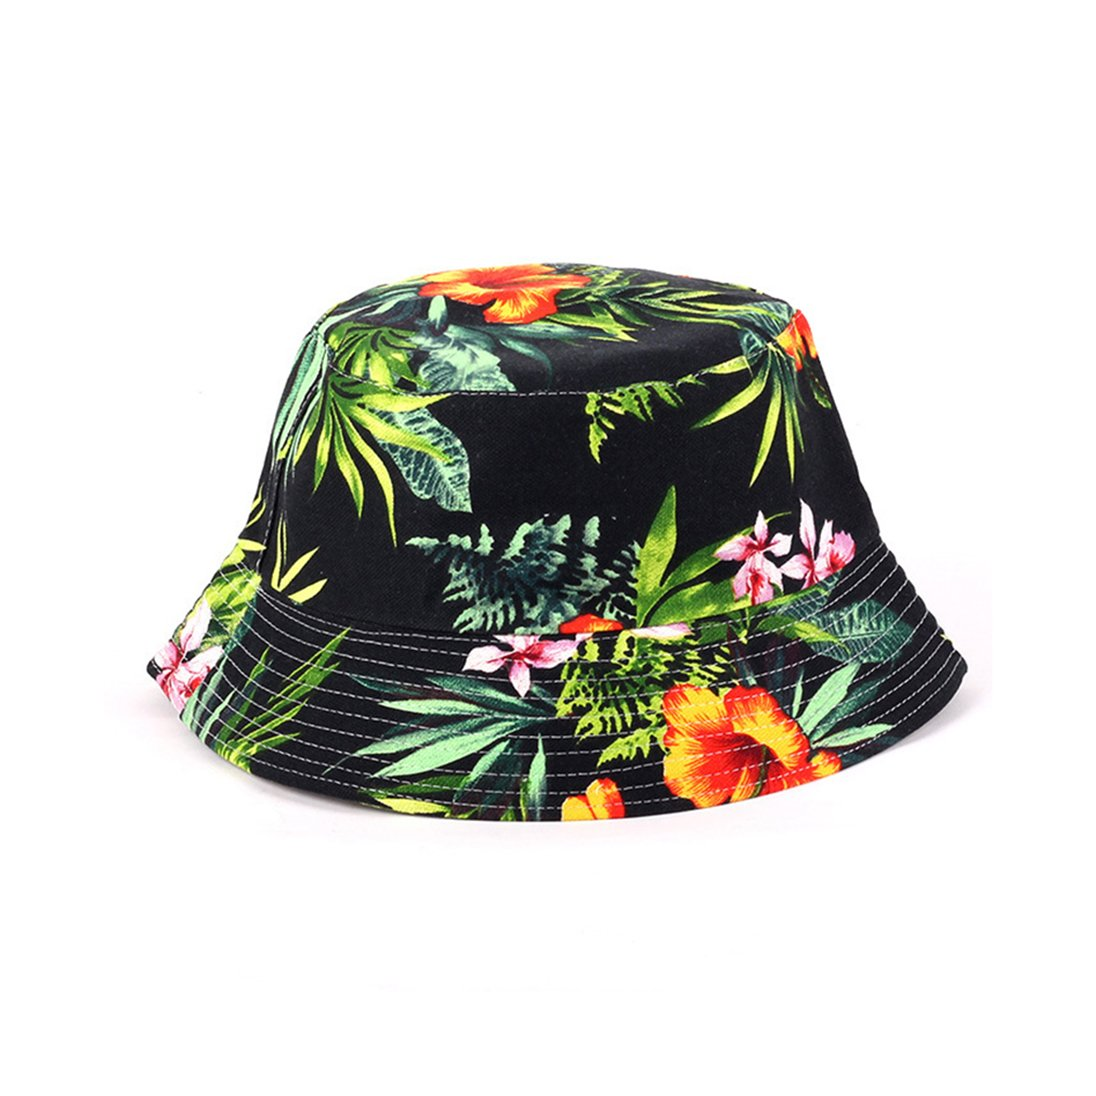 Eohak 渔夫帽黑色花卉印花  夏季女式男式渔夫帽可折叠渔夫帽